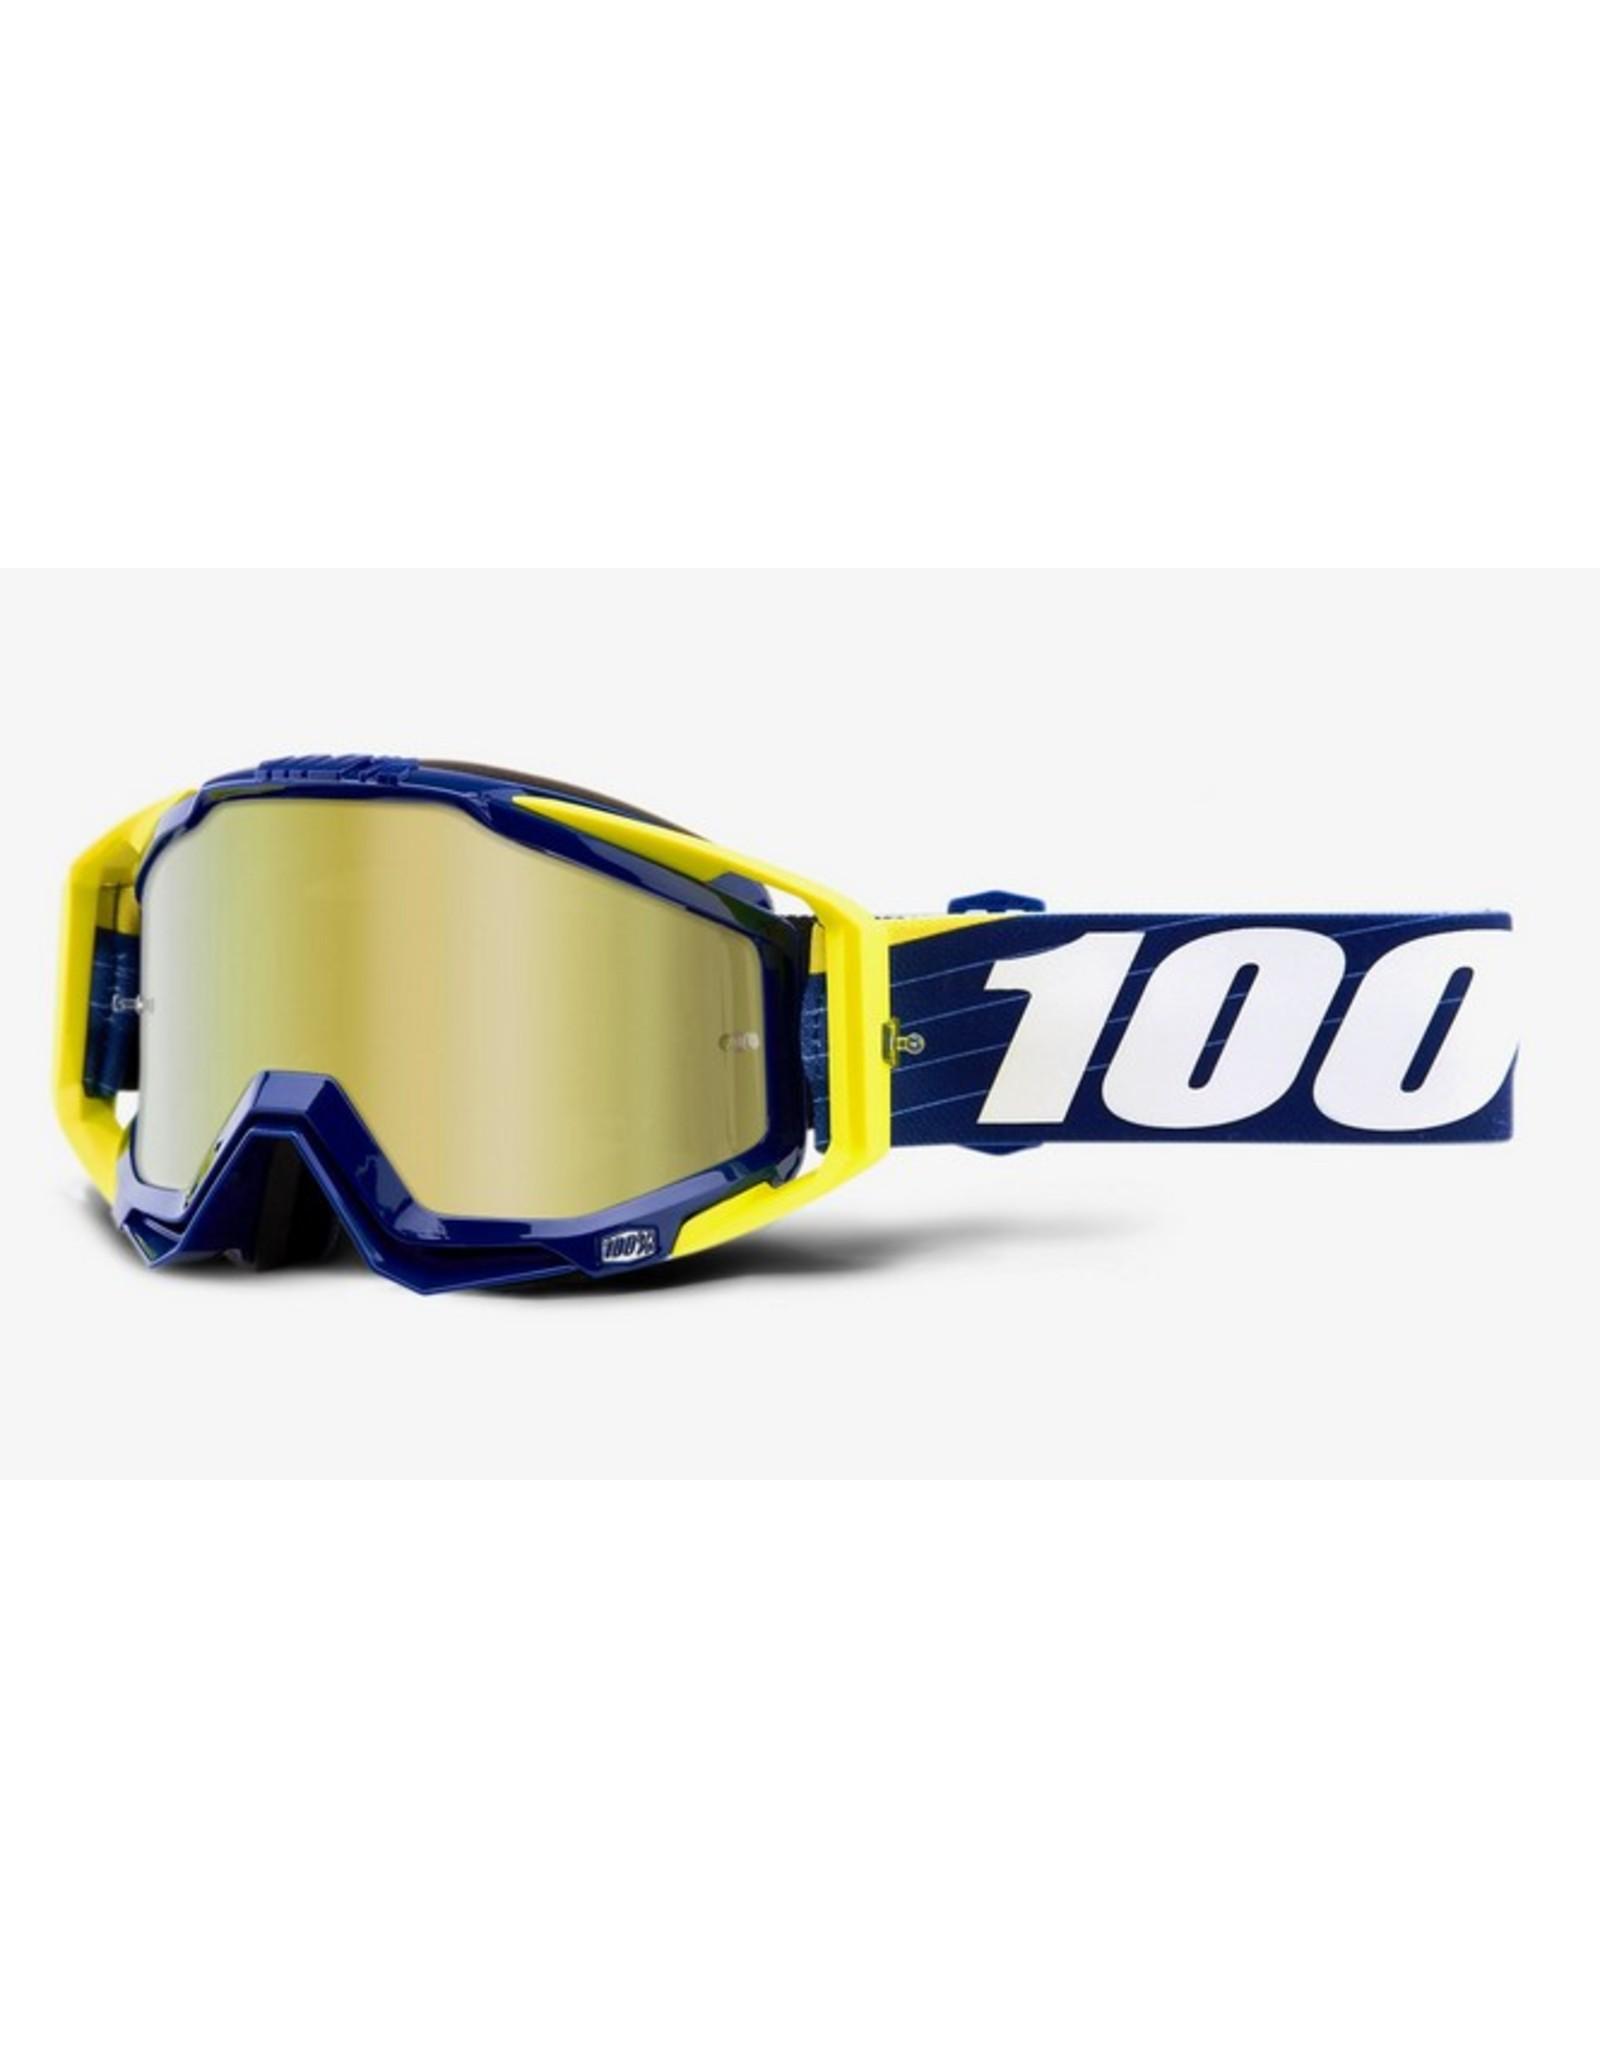 100% 100% Racecraft Goggle Bibal/Navy